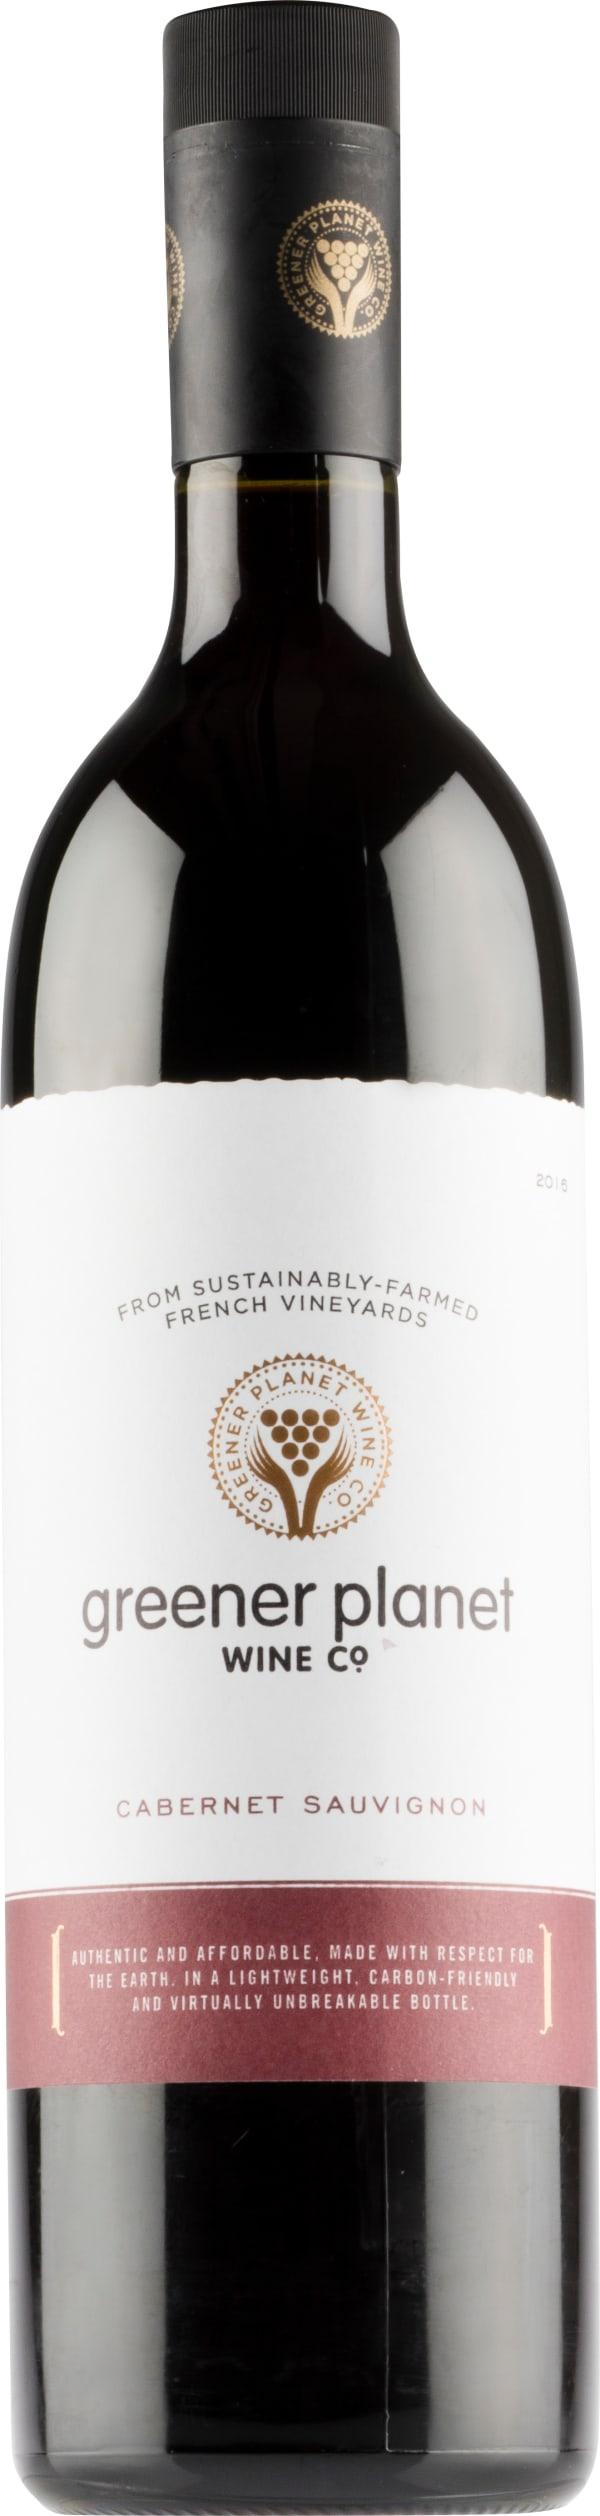 Greener Planet Cabernet Sauvignon 2019 plastic bottle